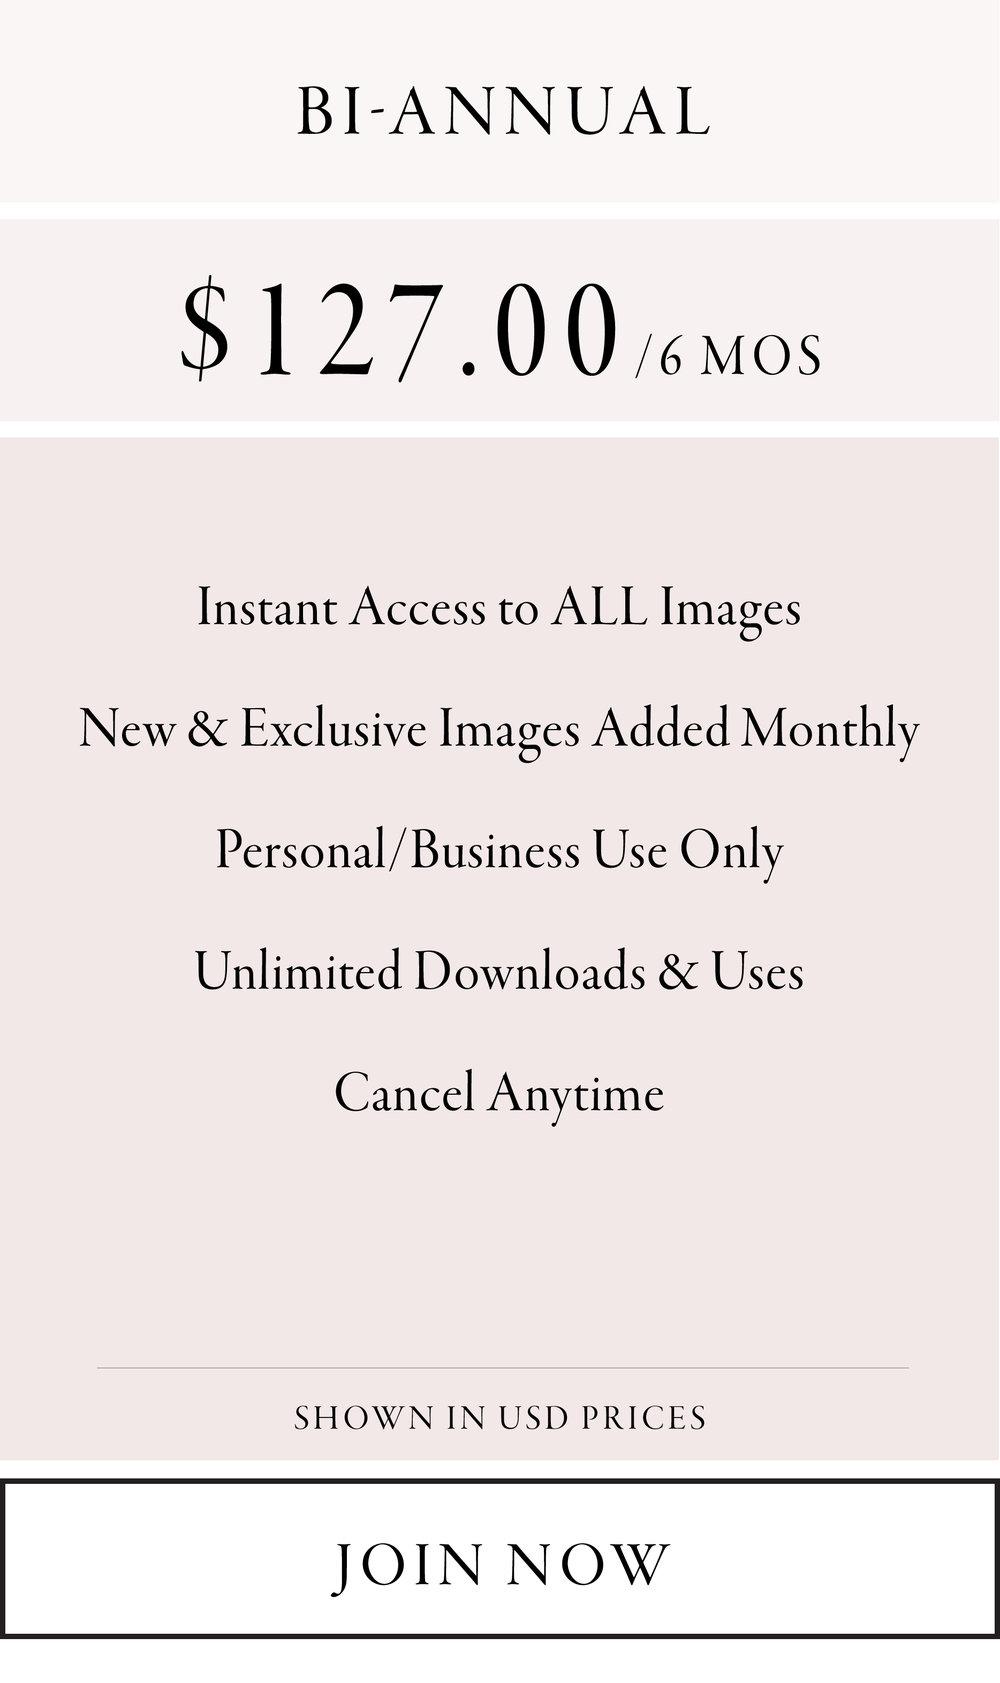 Price-Tables-127.jpg